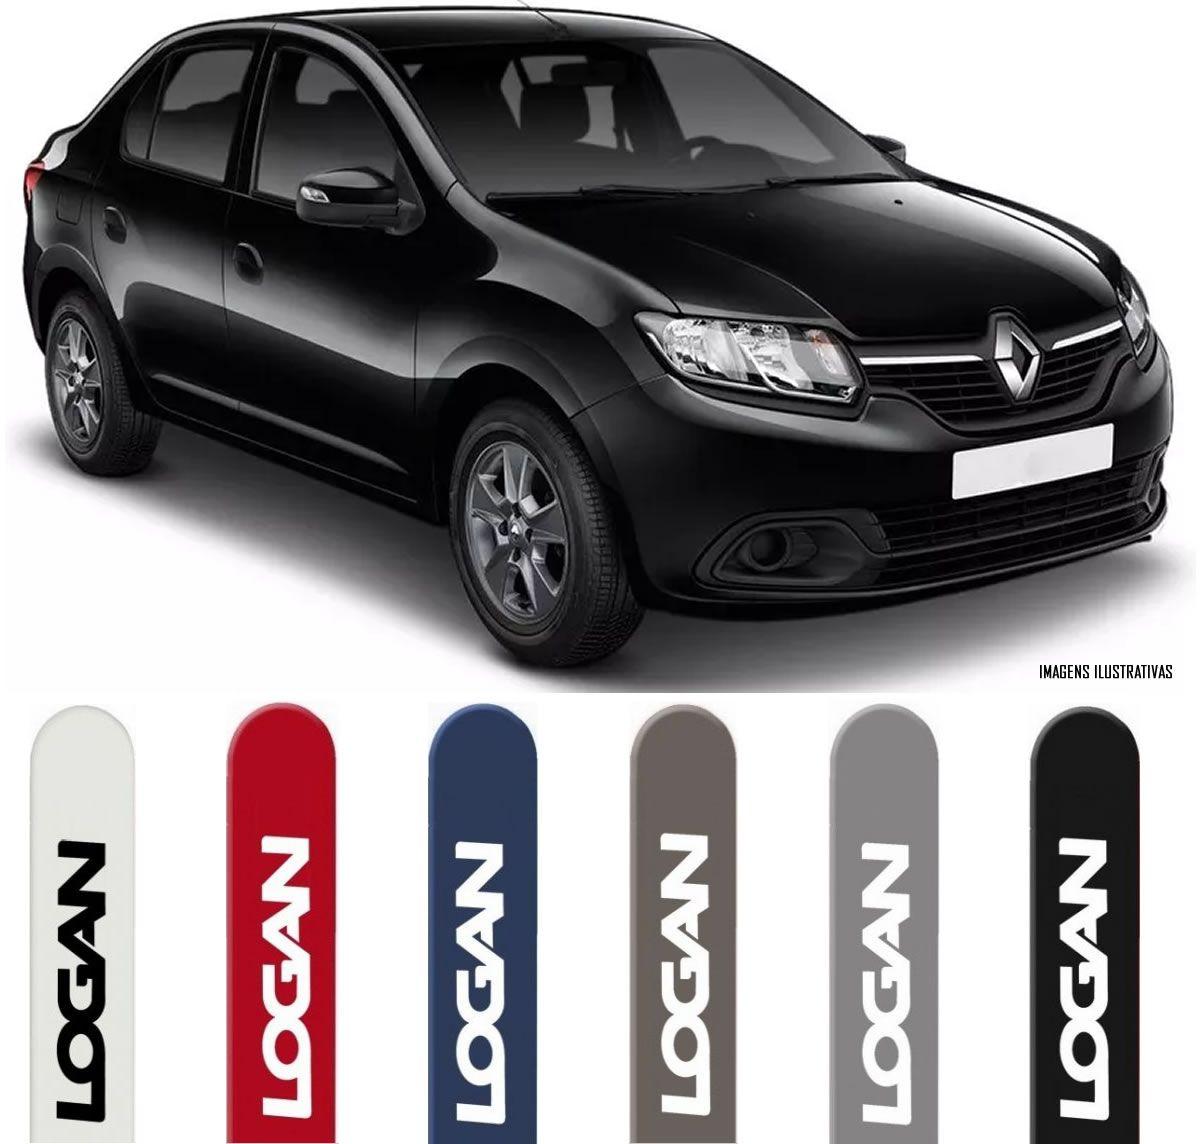 Jogo Friso Lateral Pintado Renault Logan 2013 2014 2015 2016 2017 2018 - Cor Original